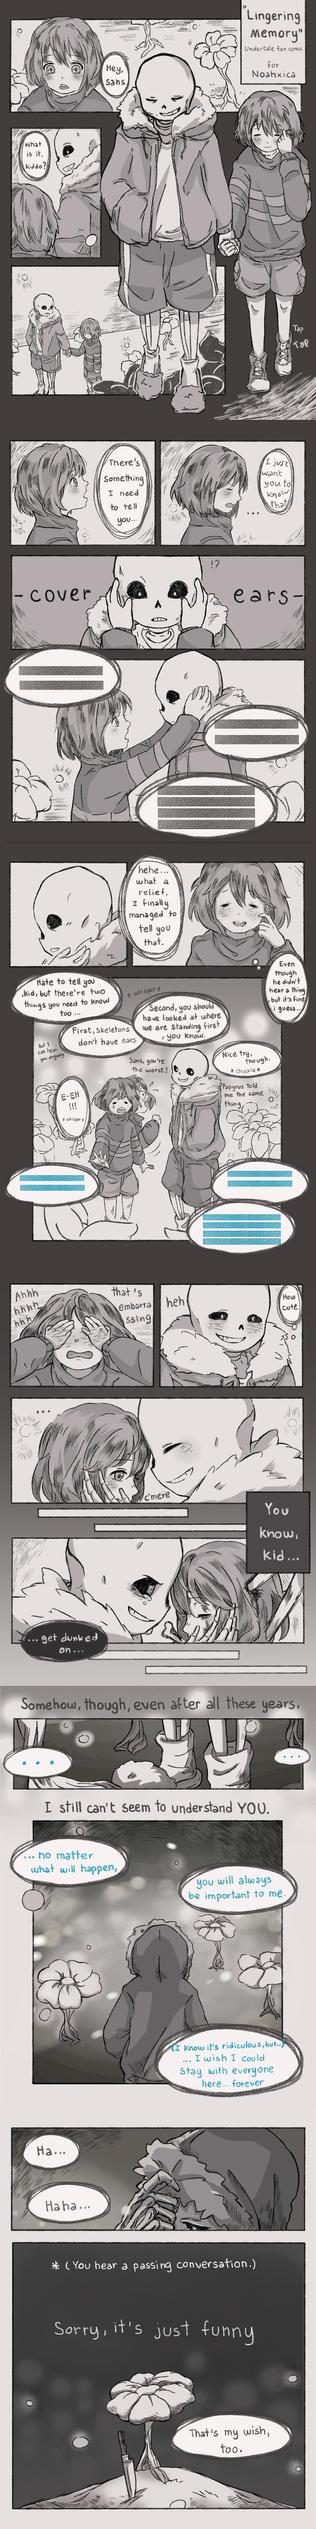 [Undertale]  Lingering Memory by hamvitita